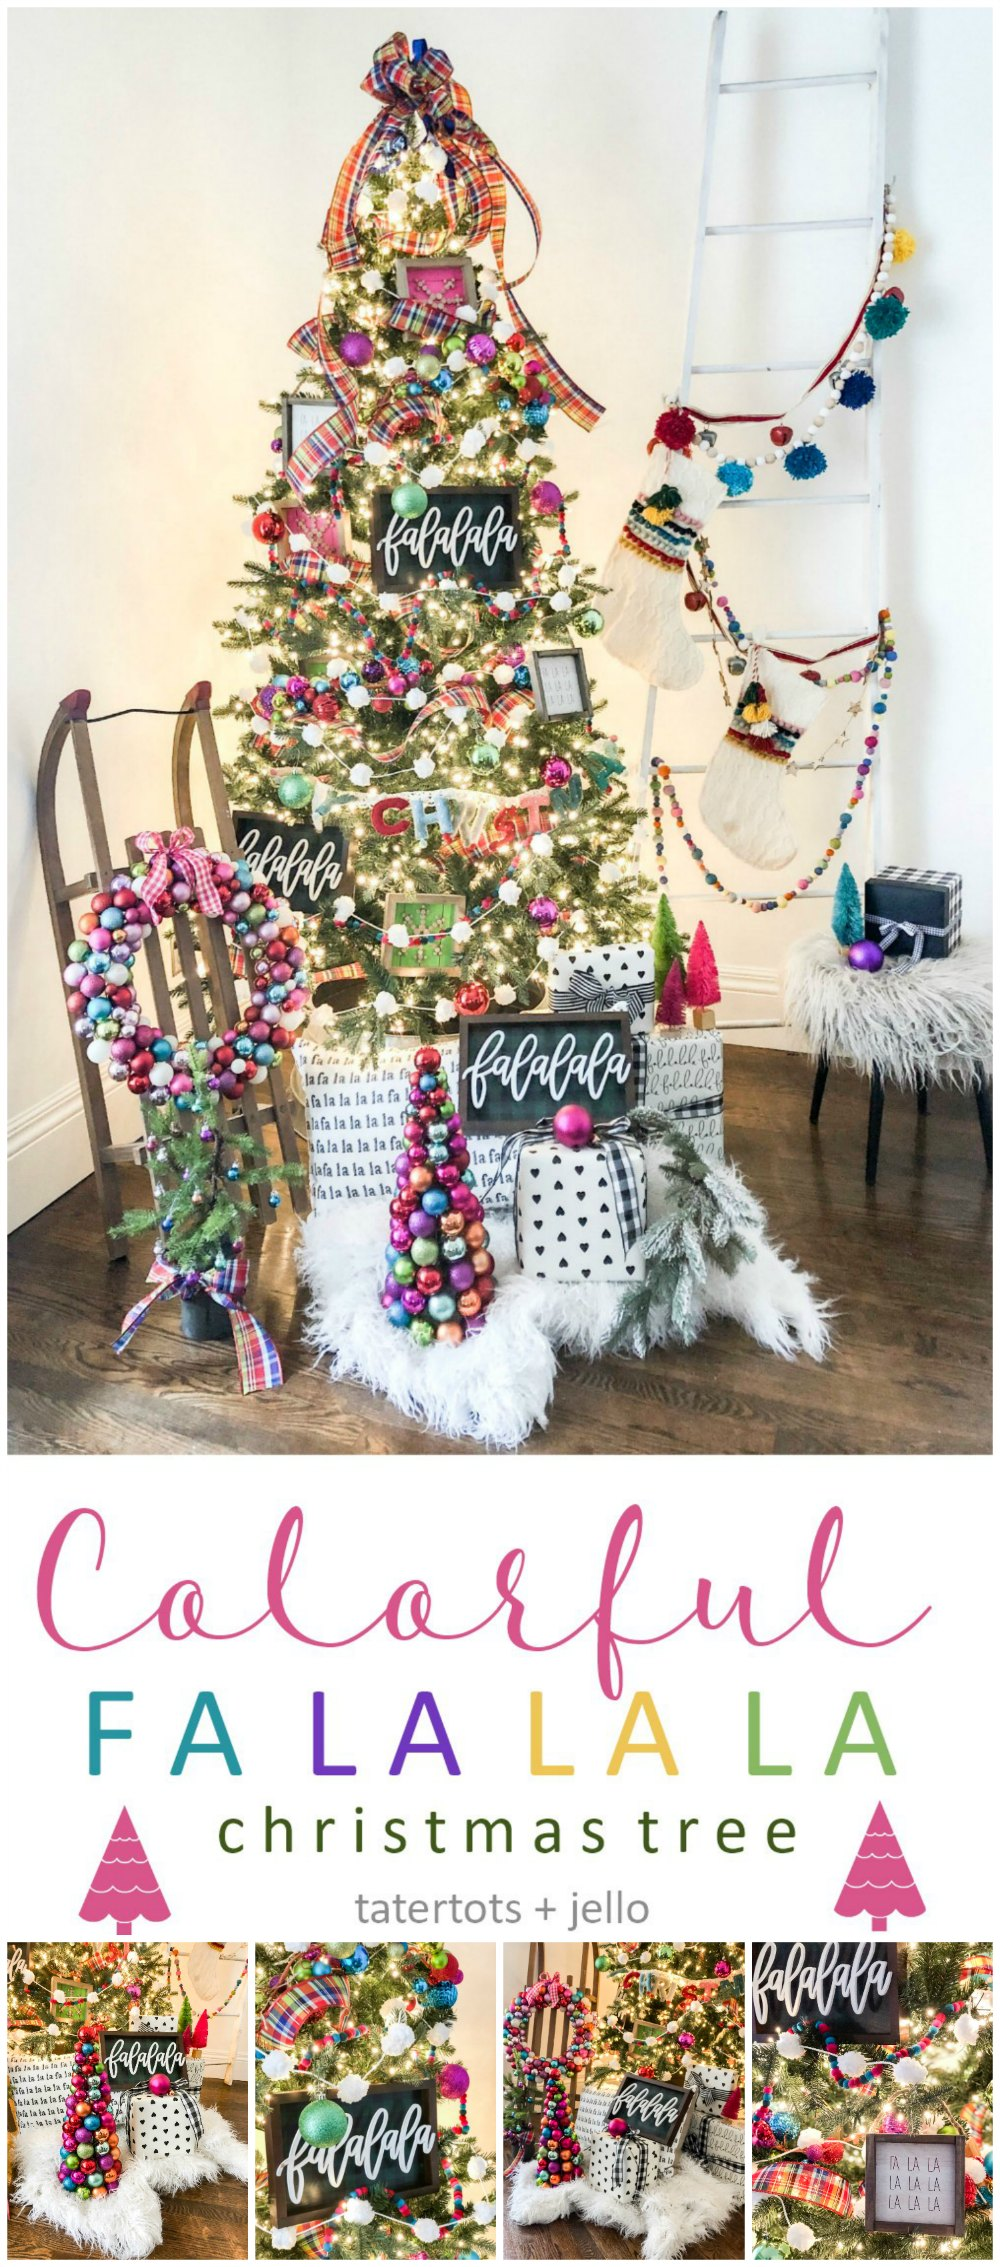 How To Create A Colorful Christmas Tree Falalala Theme